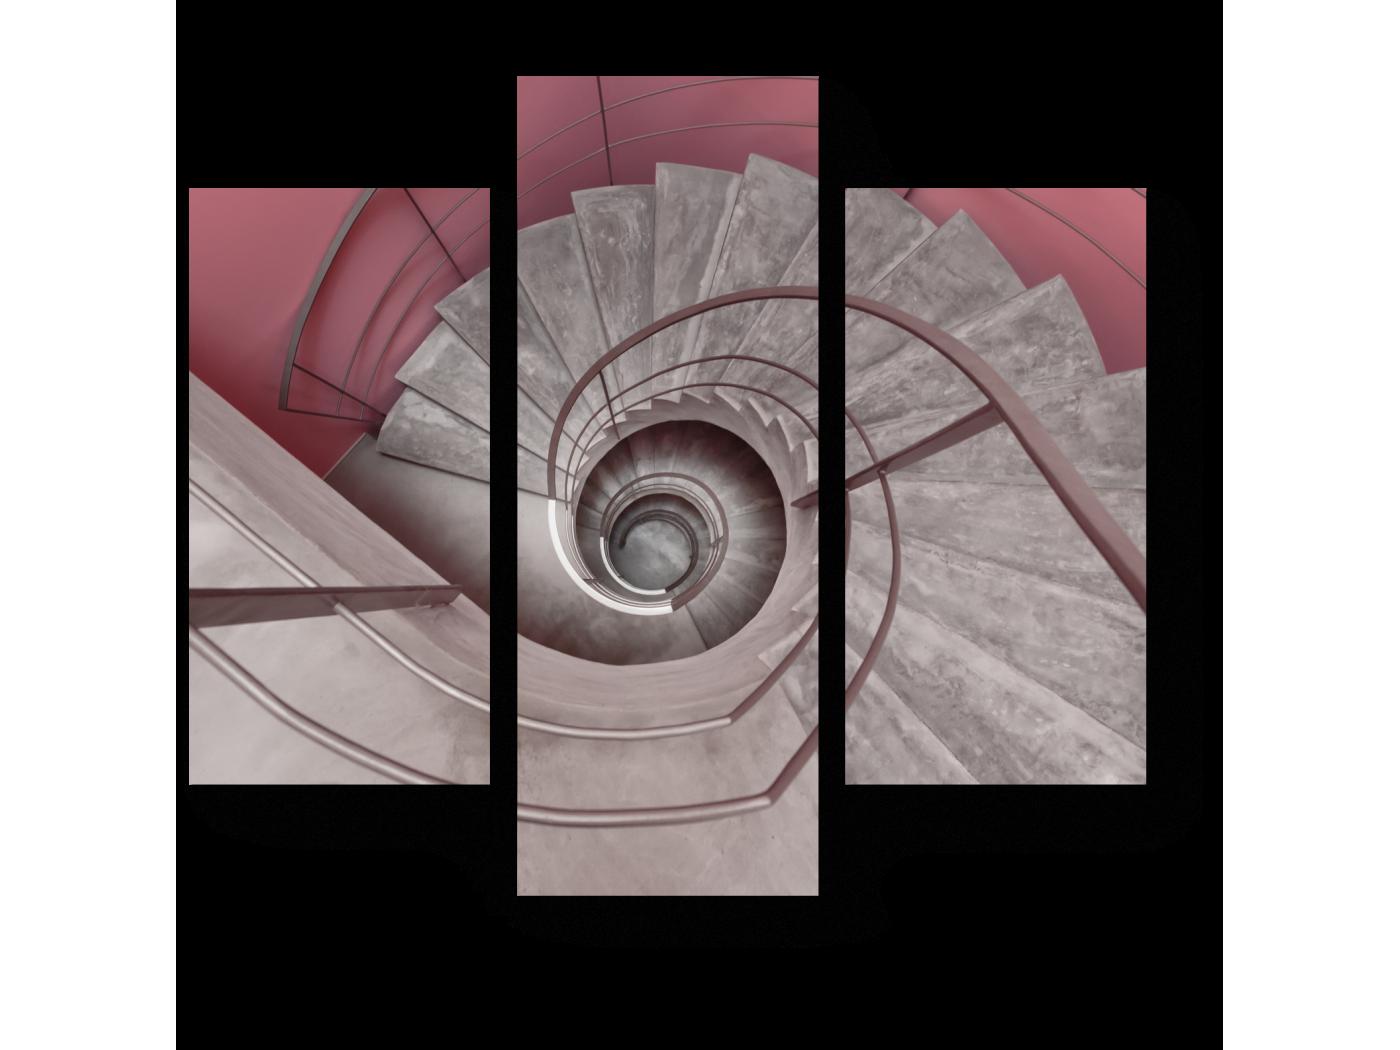 Модульная картина Спиральная лестница (60x54) фото